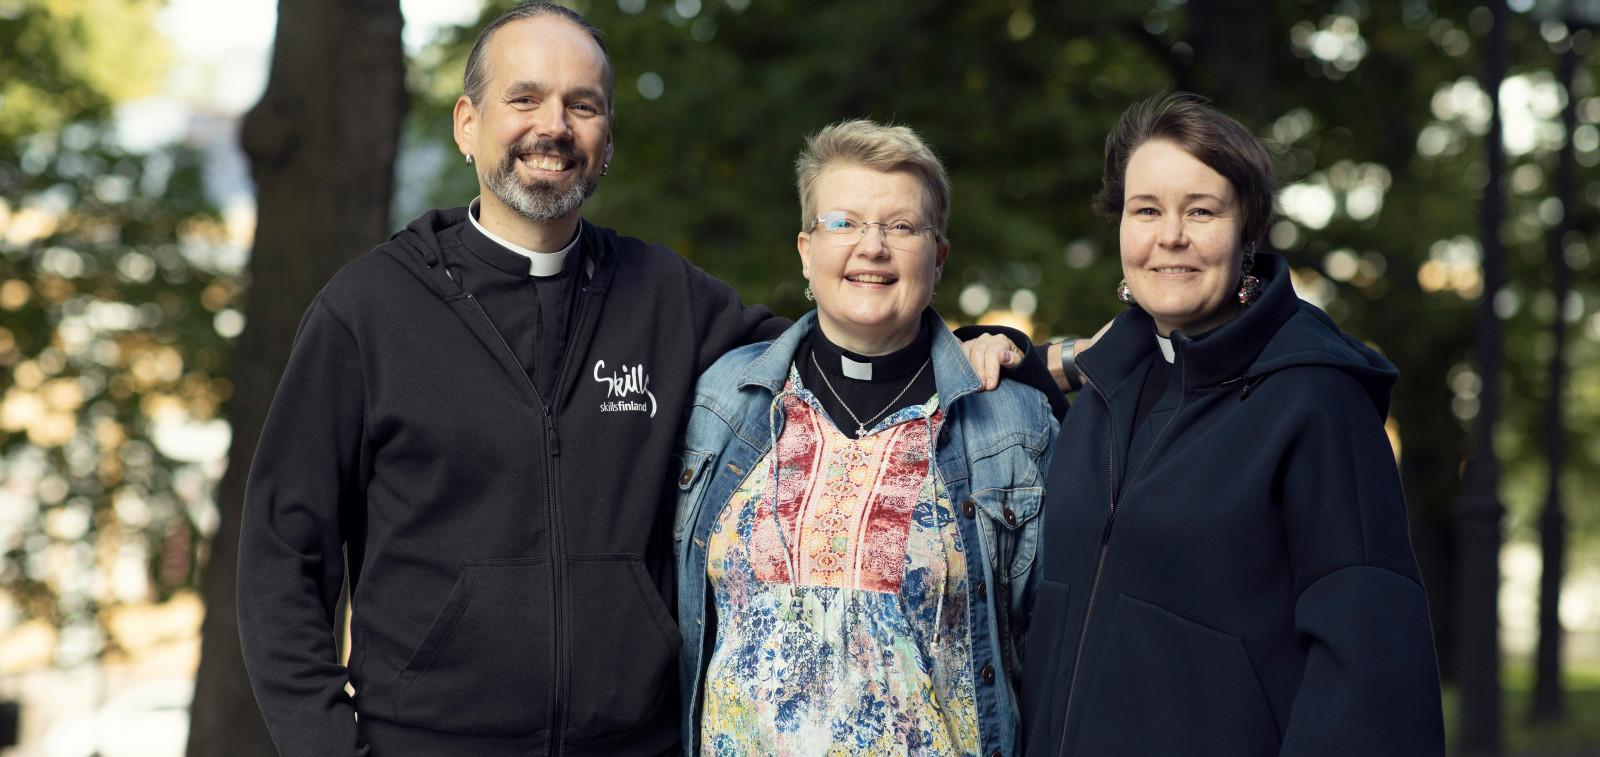 Papit hymyilevät vieretysten.